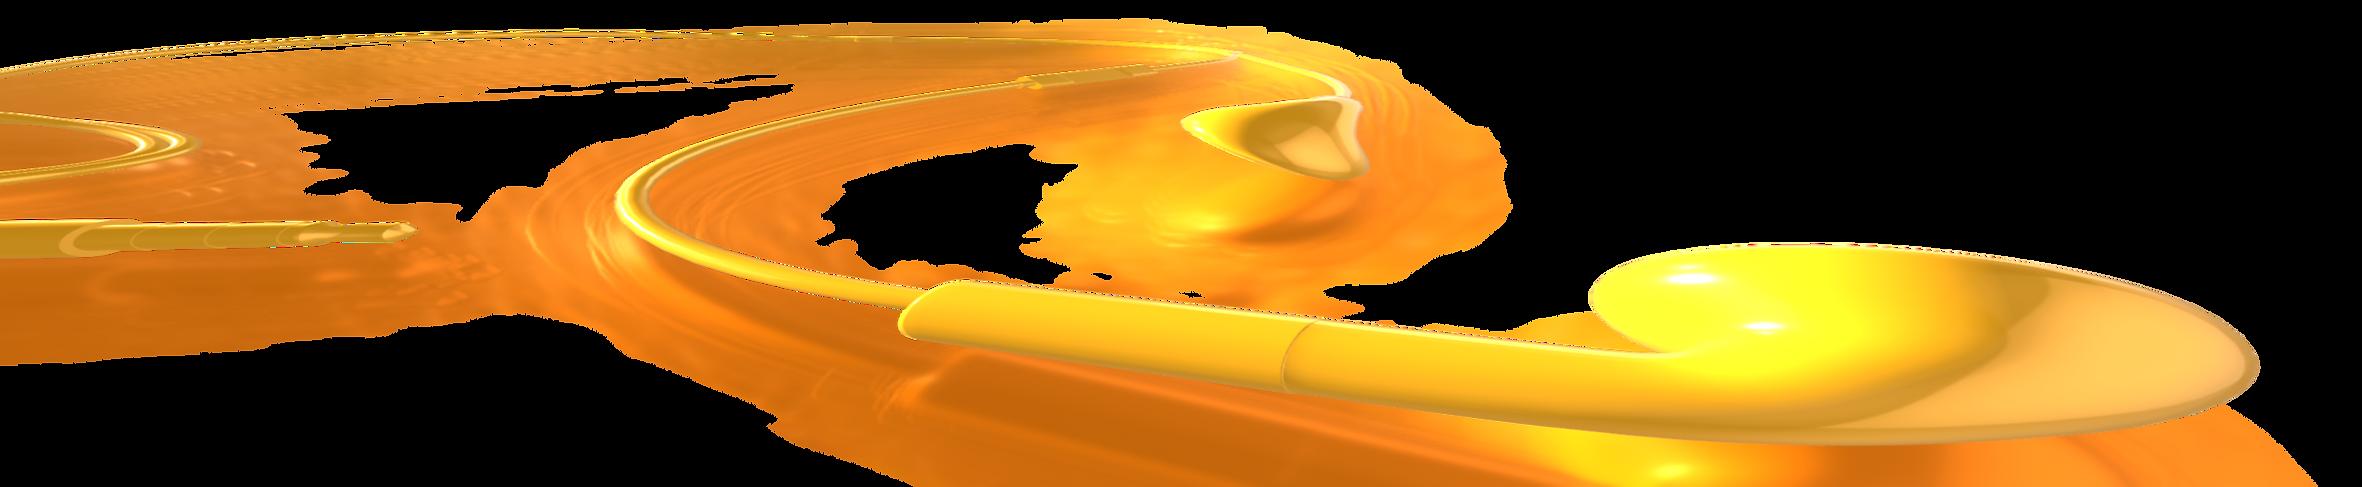 Fone 3D Reveillon Mágico de Floripa